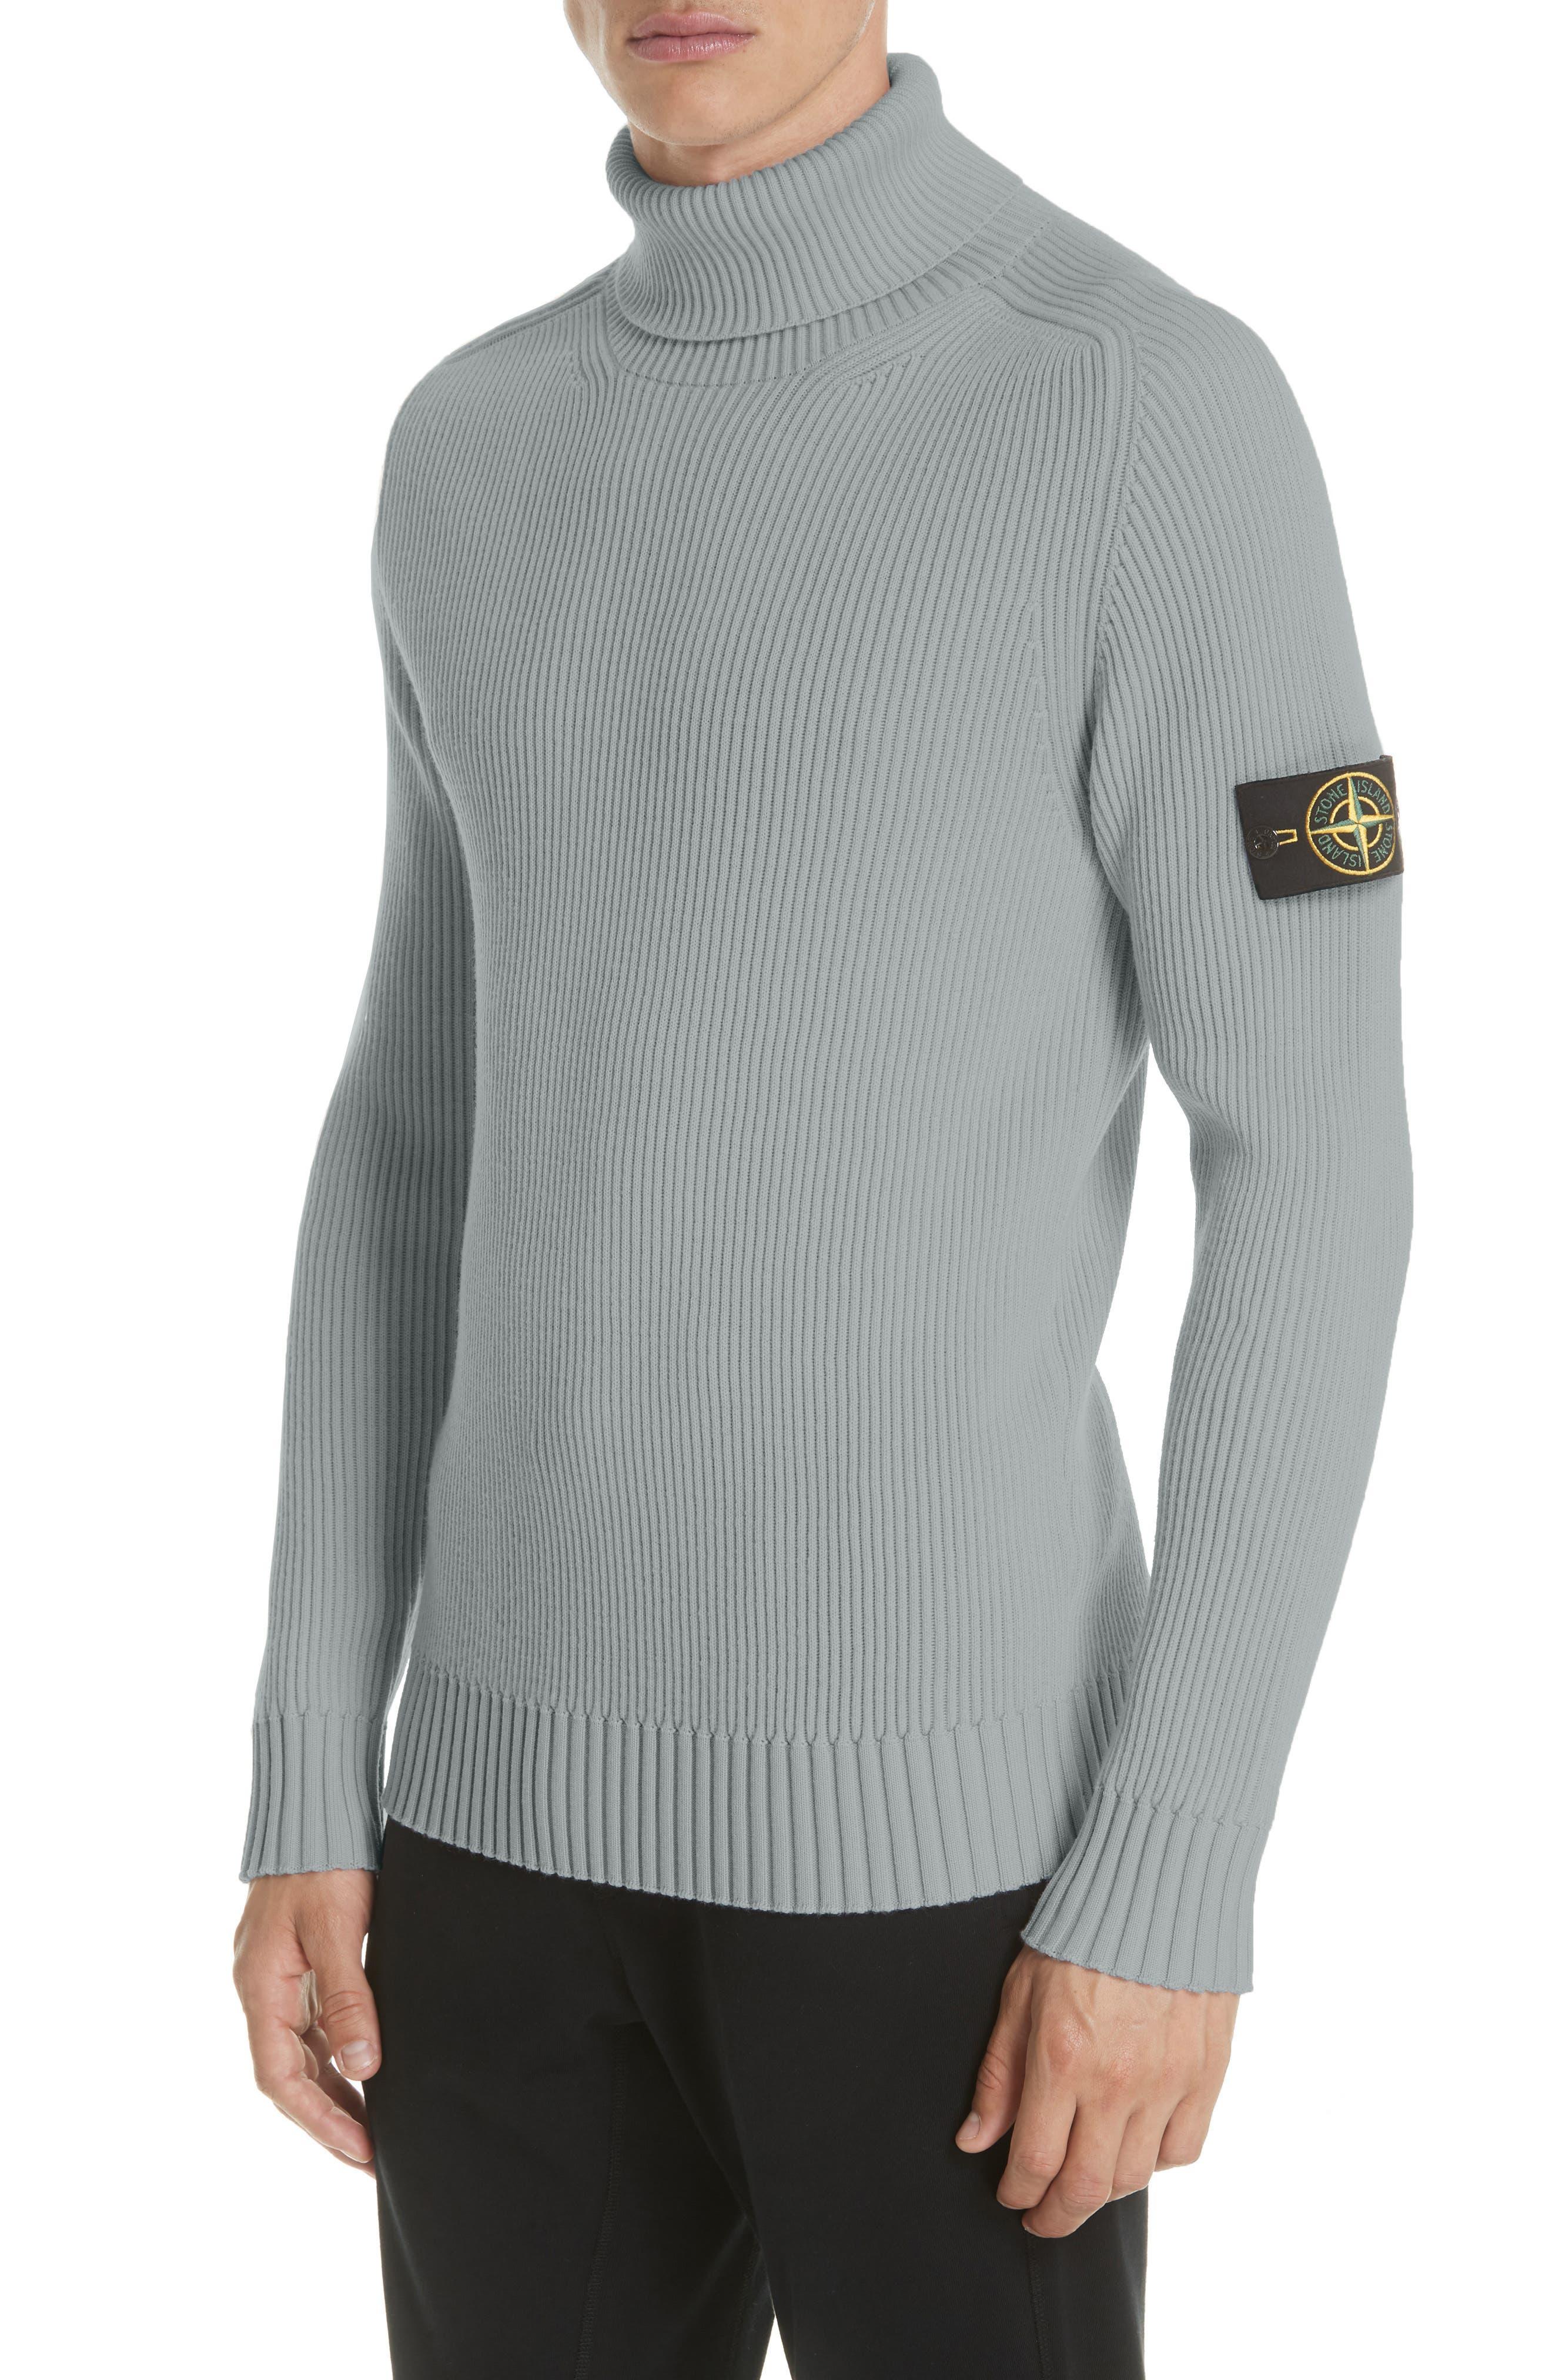 Ribbed Wool Turtleneck Sweater,                             Main thumbnail 1, color,                             GREY